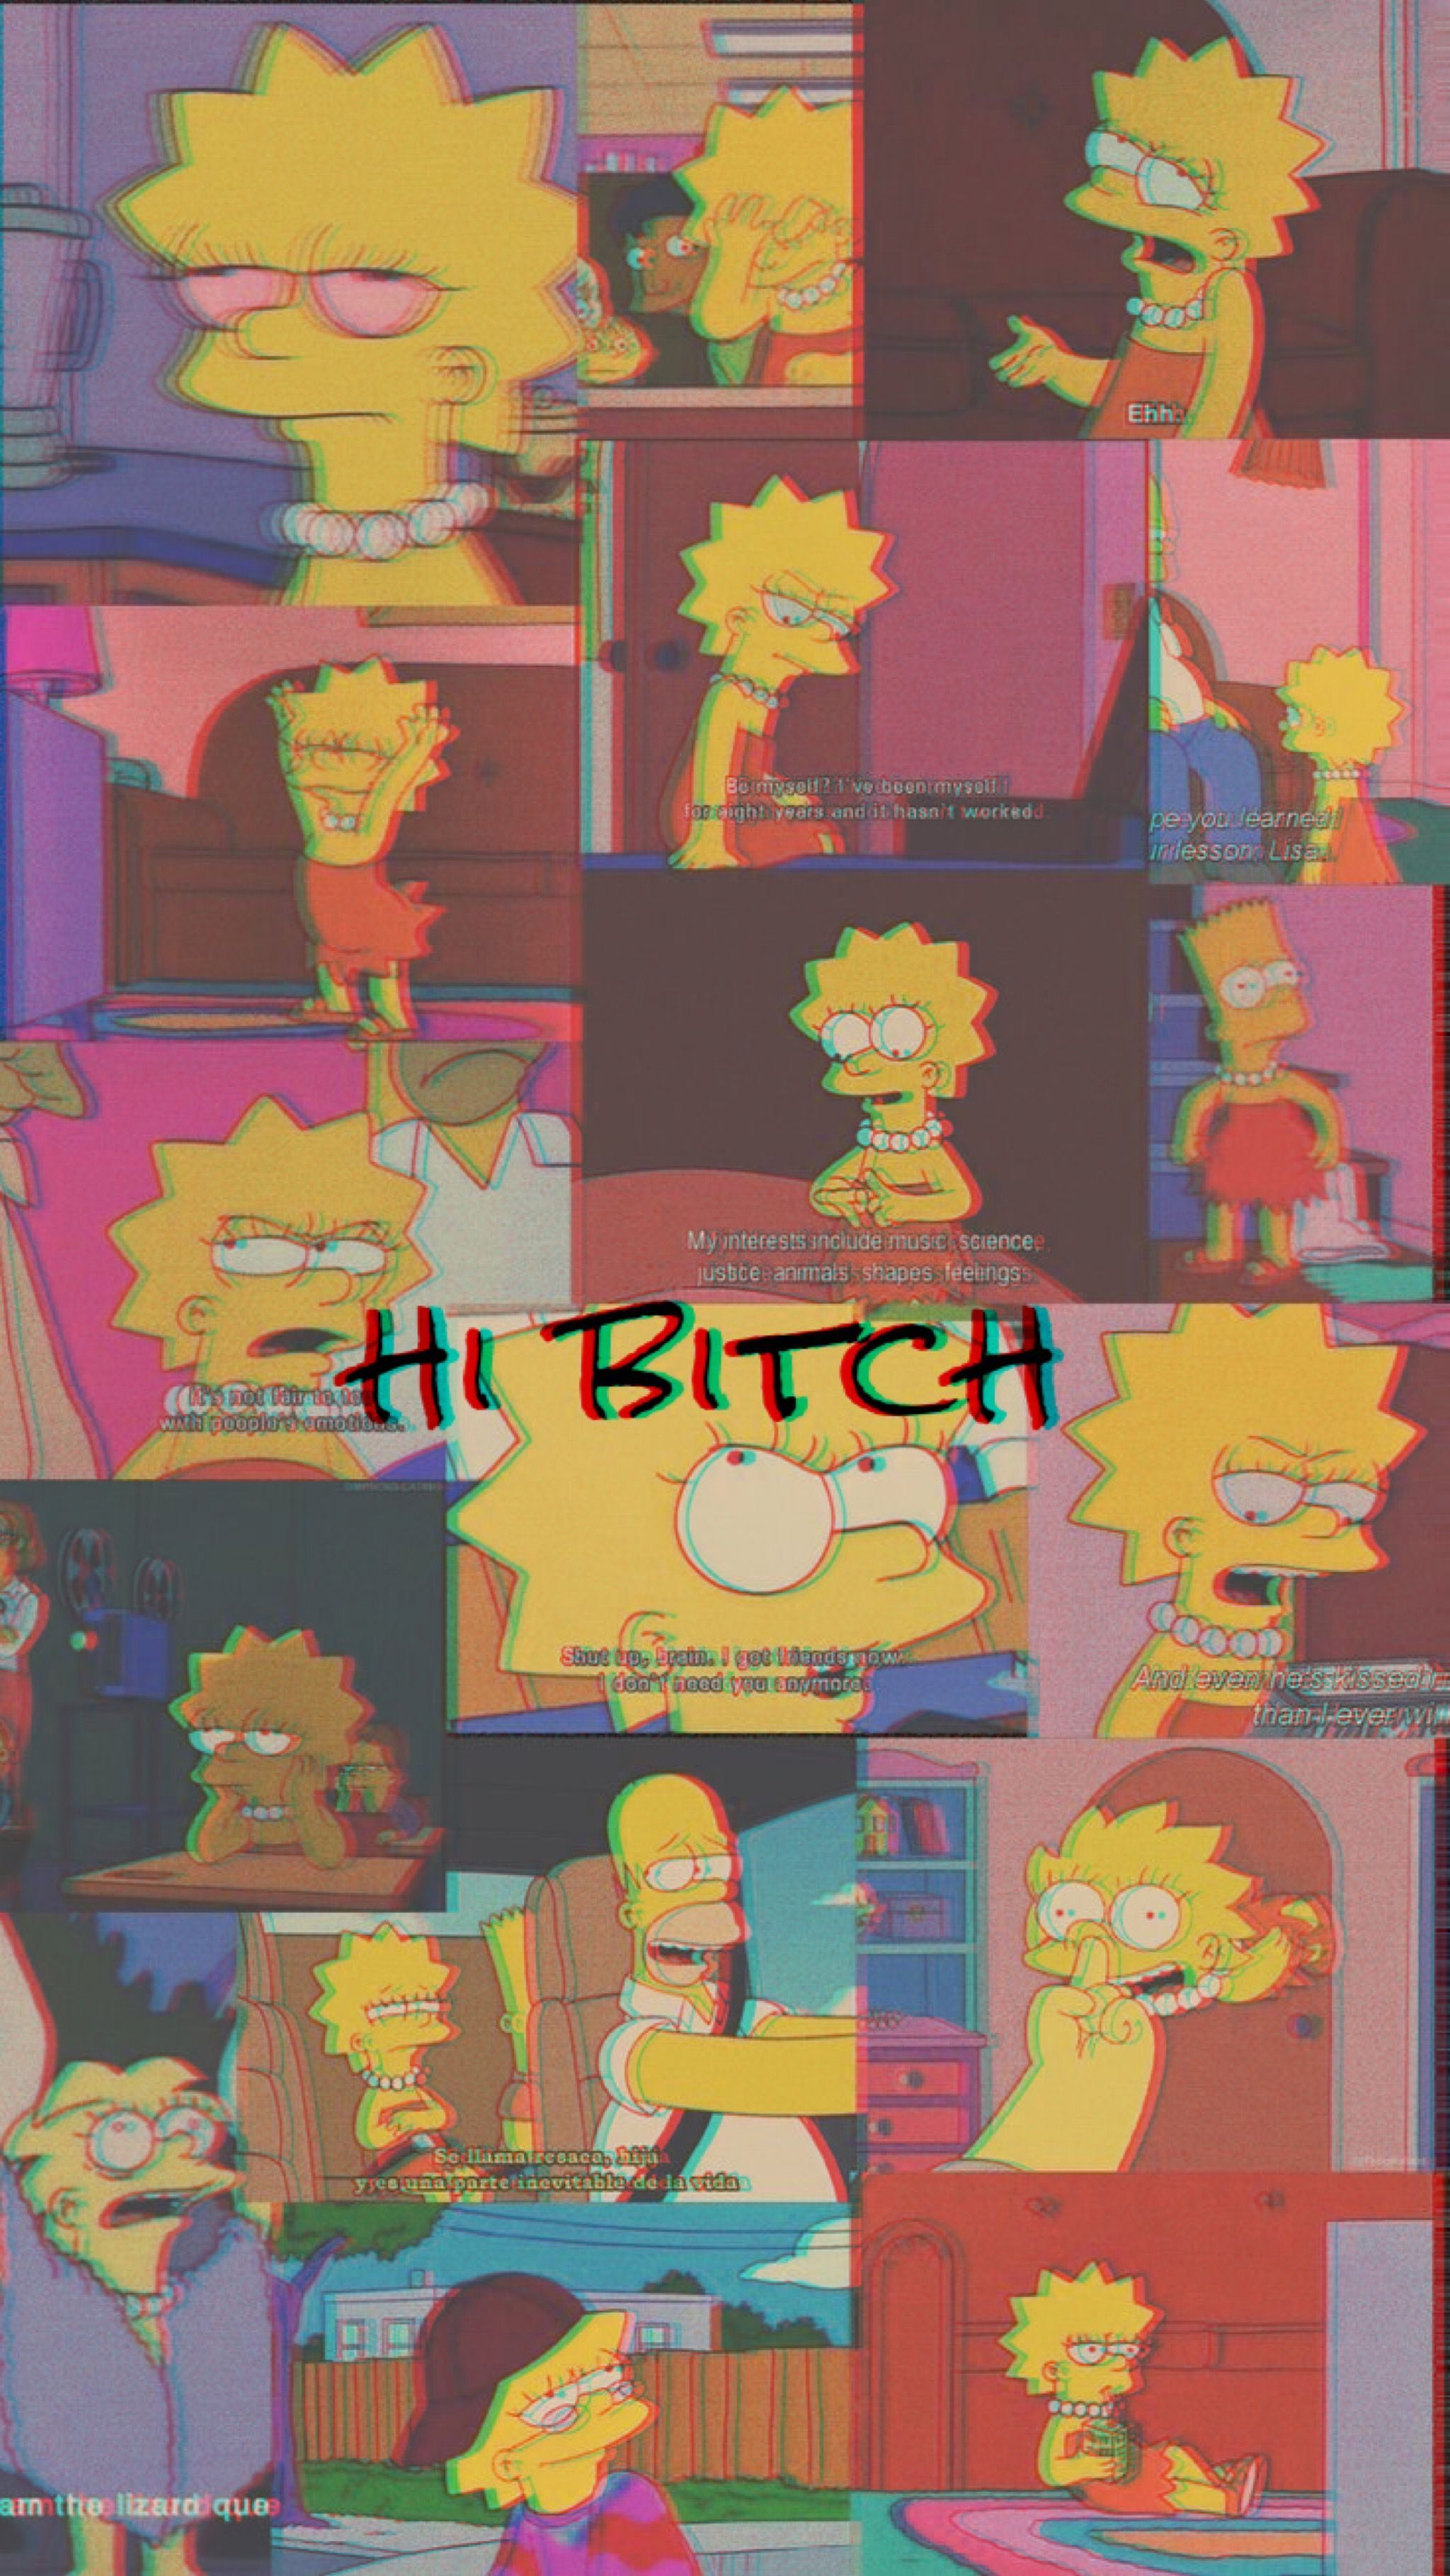 Sad Lisa Simpson Wallpapers Top Free Sad Lisa Simpson Backgrounds Wallpaperaccess